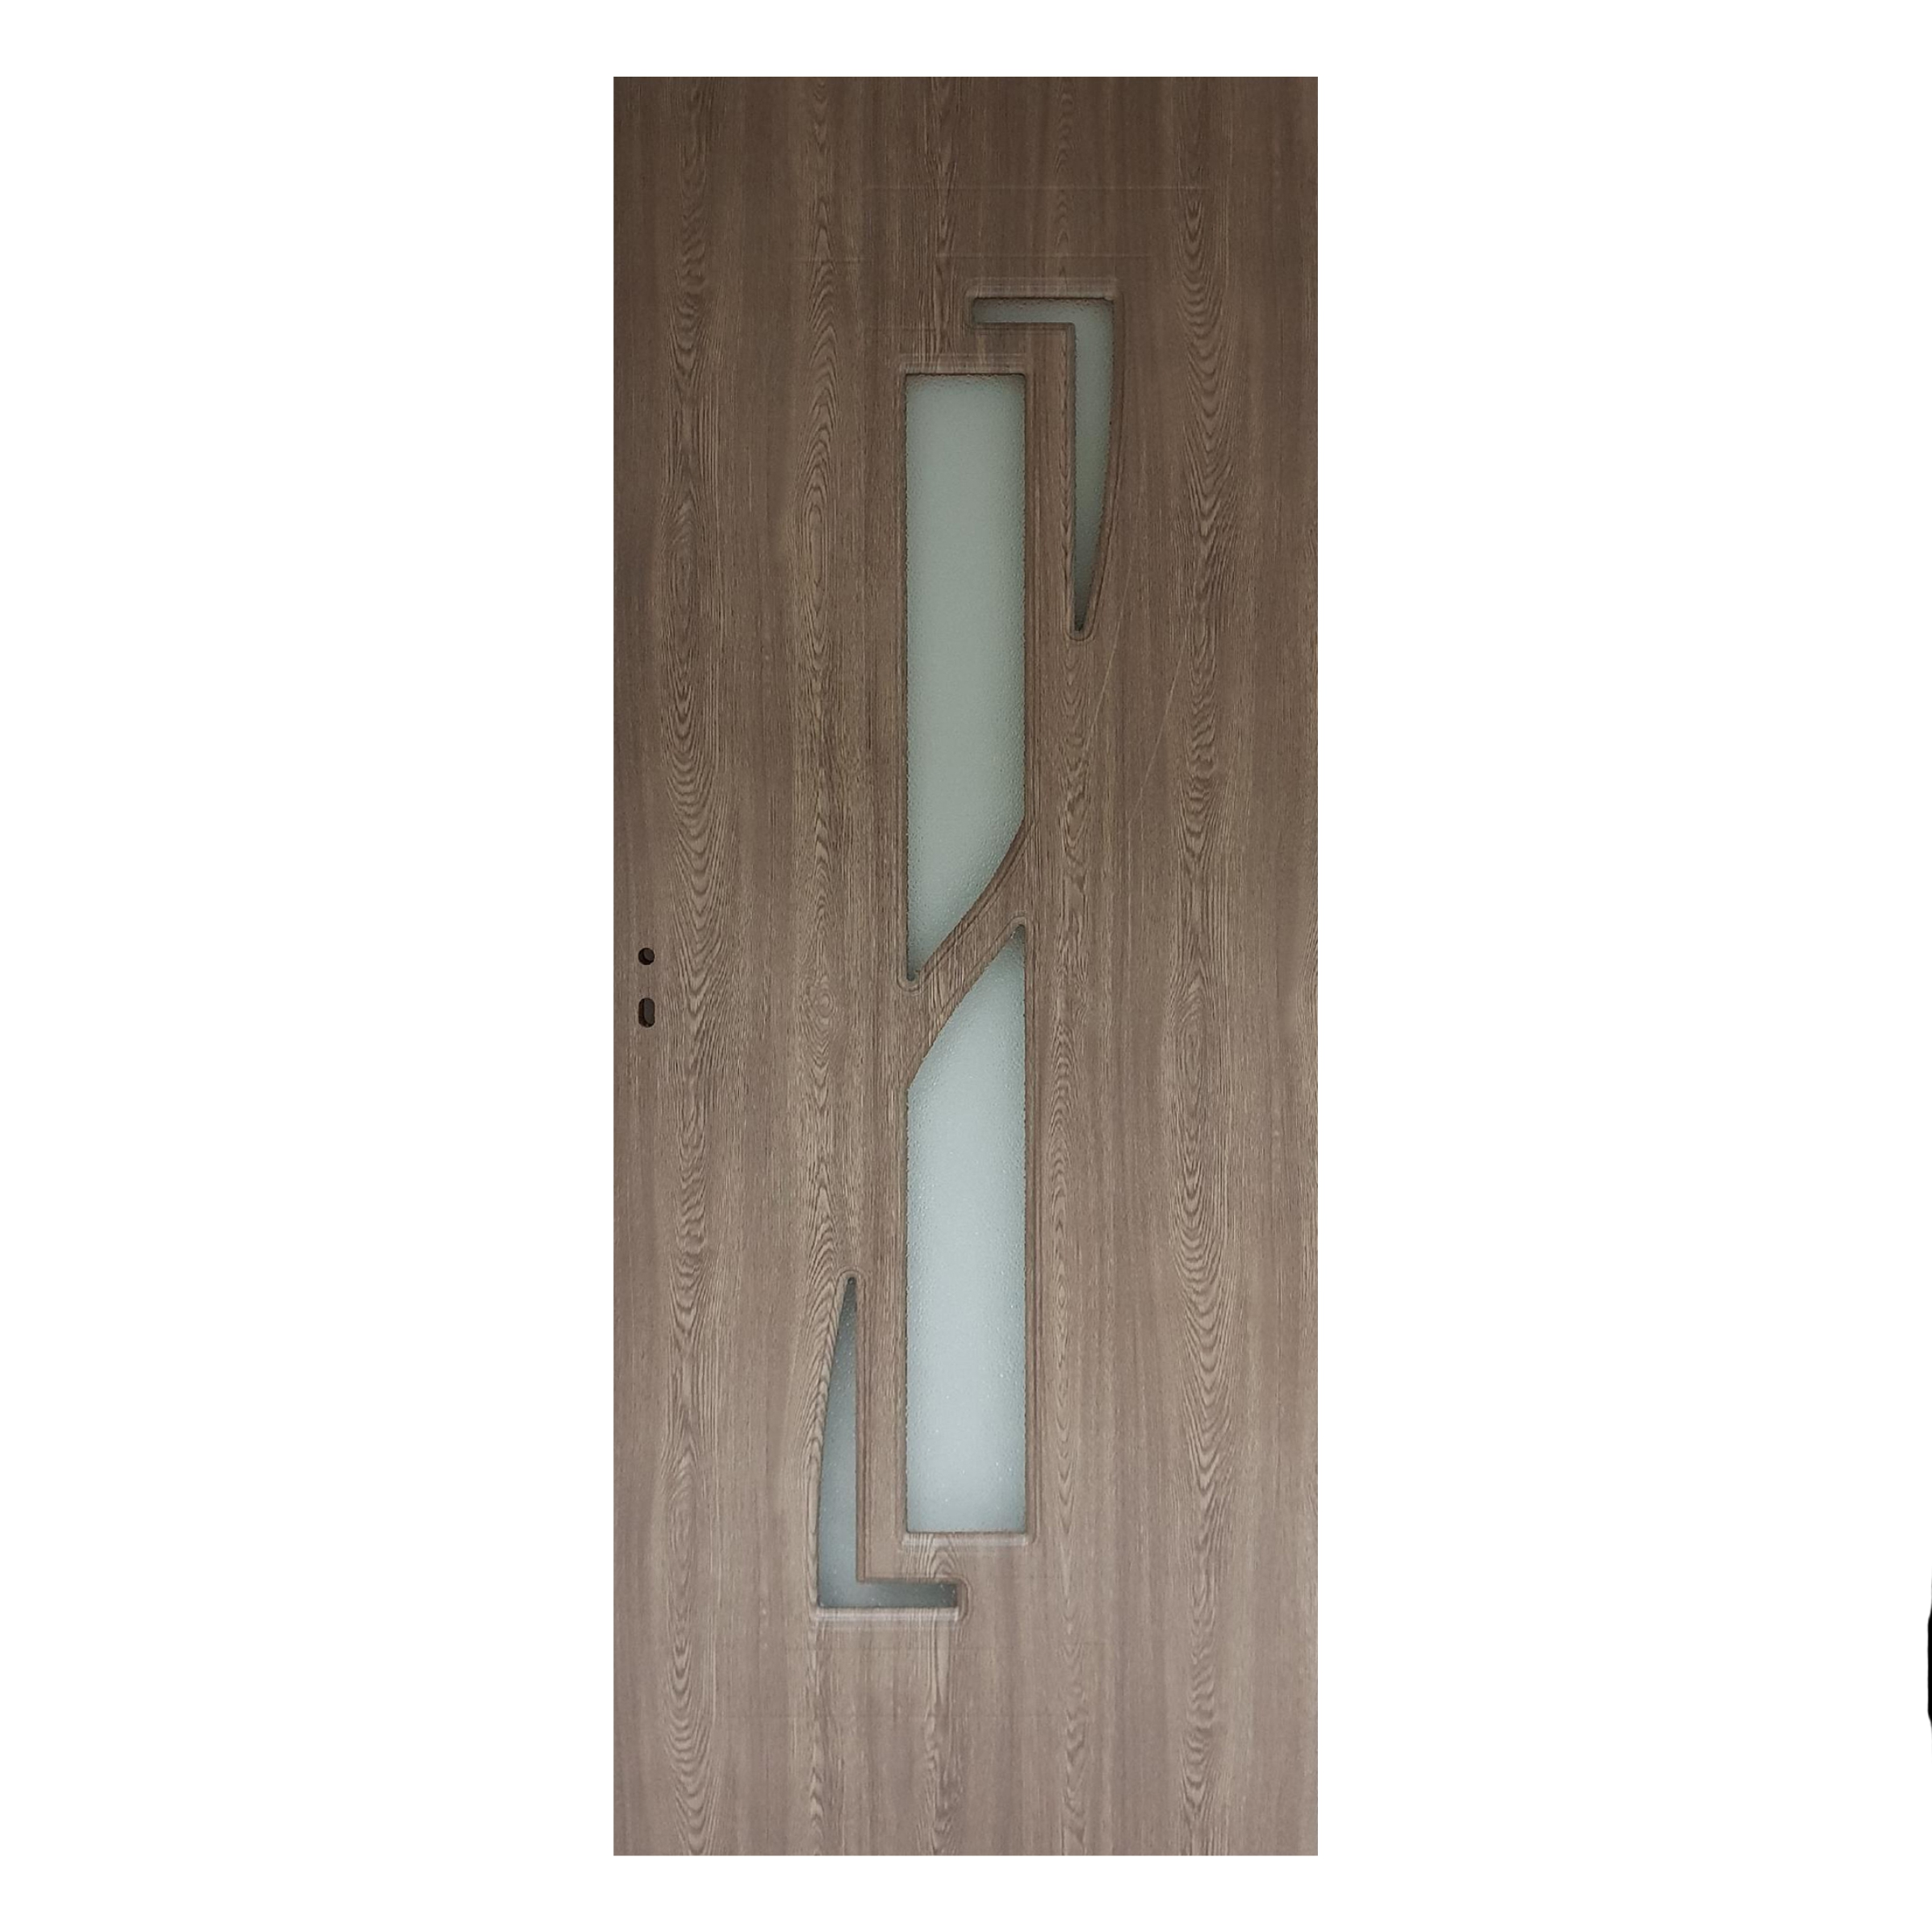 Usa interior cu geam Pamate M042, gri, 203 x 70 x 3,5 cm + toc 10 cm, reversibila mathaus 2021